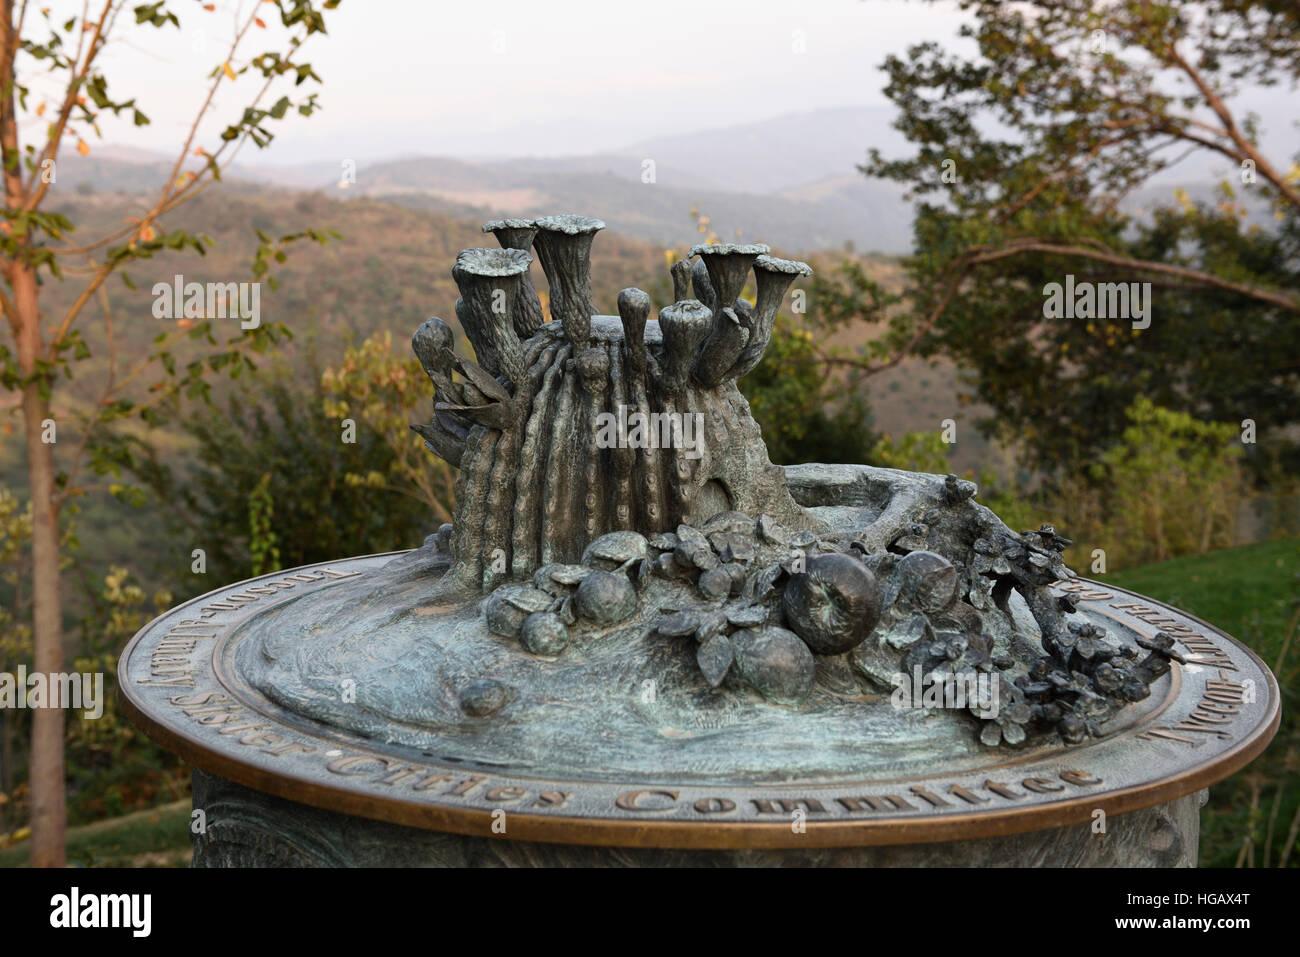 Tucson Almaty sister city plaque with flowering cactus on Kok Tobe mountain Kazakhstan - Stock Image